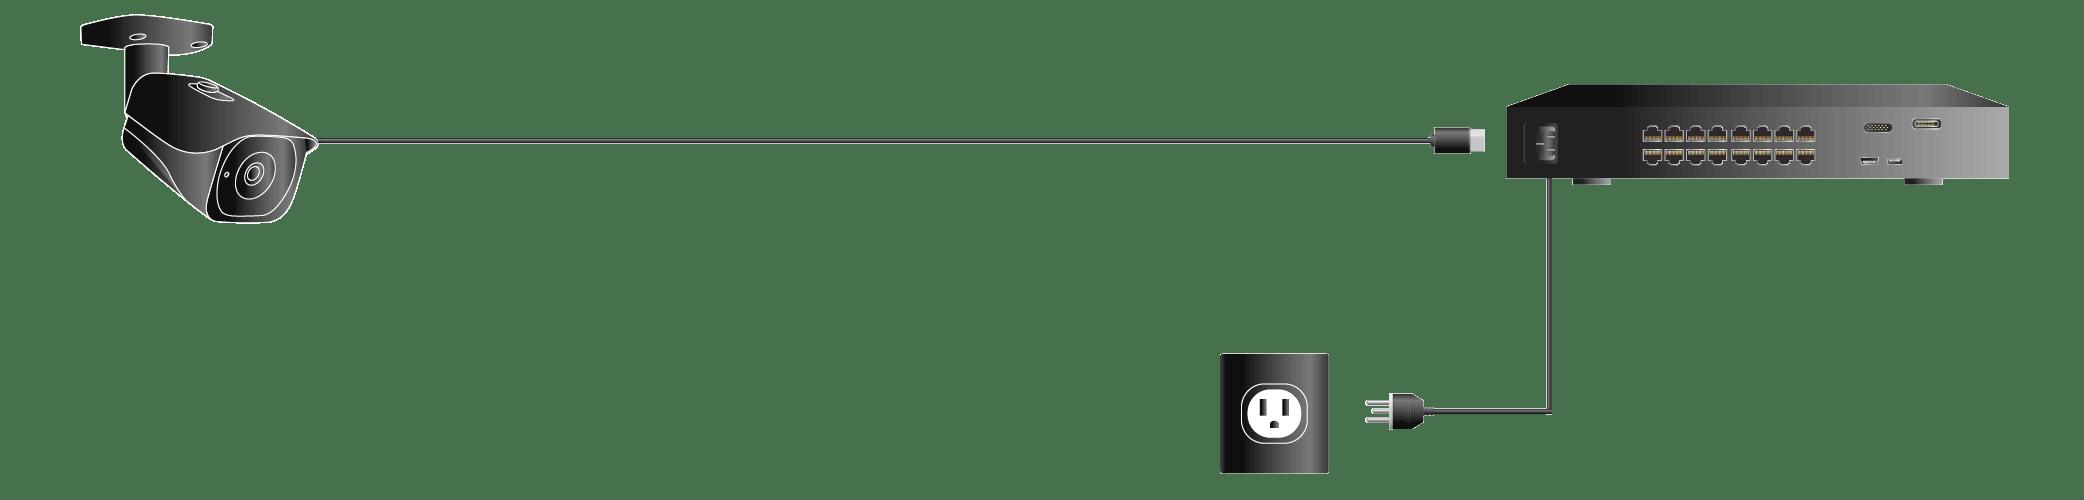 ip-cctv-install-diagram